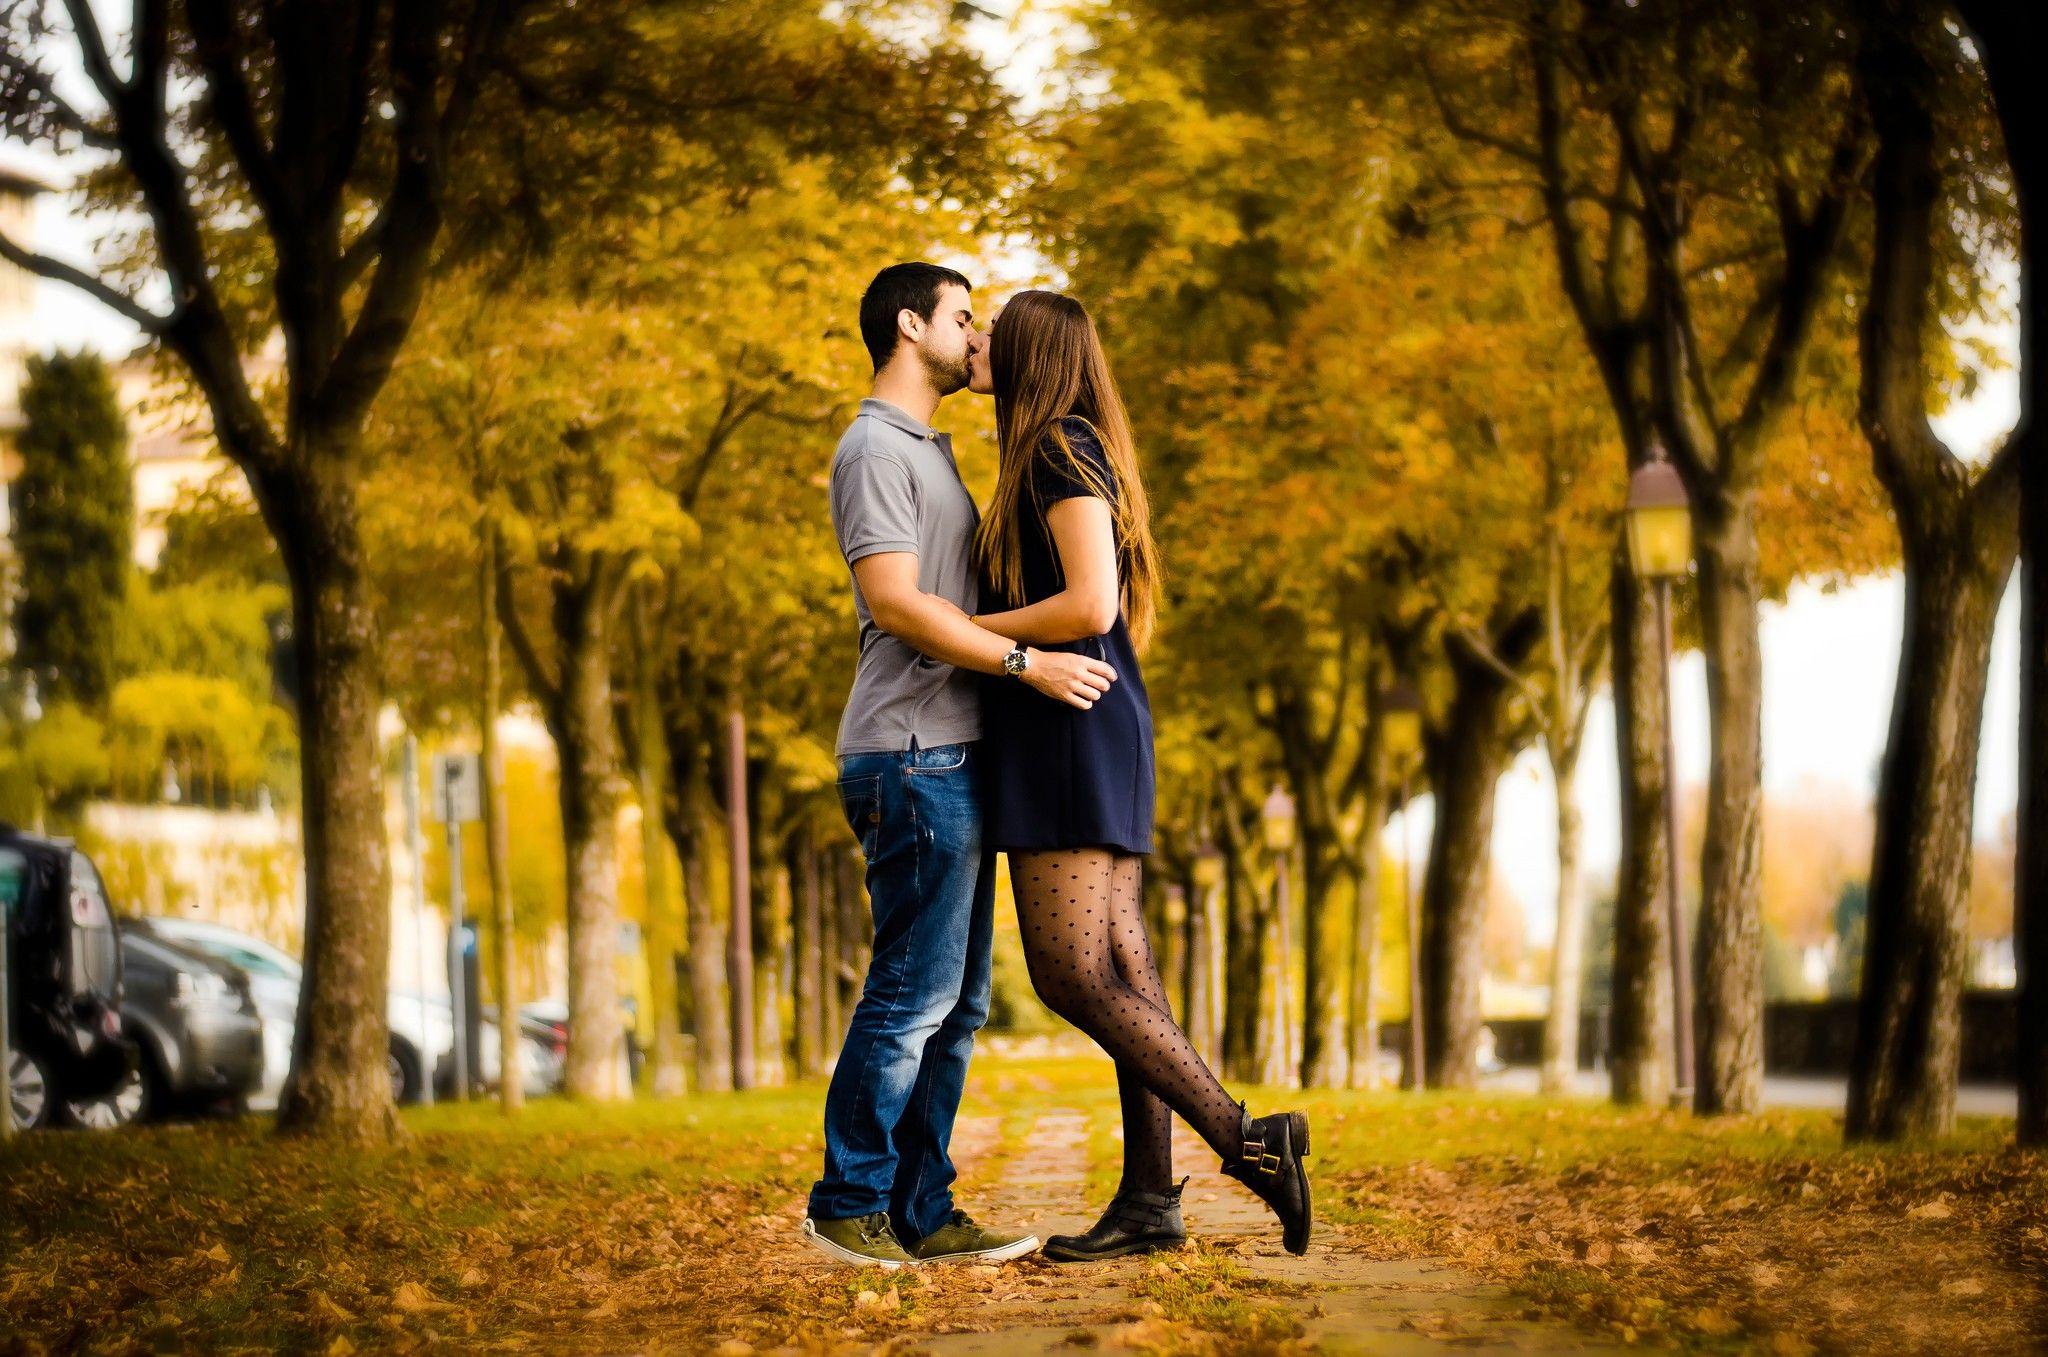 boyfriend girlfriend romantic couple kiss images profile picture 800a—501 lip kiss pic wallpapers